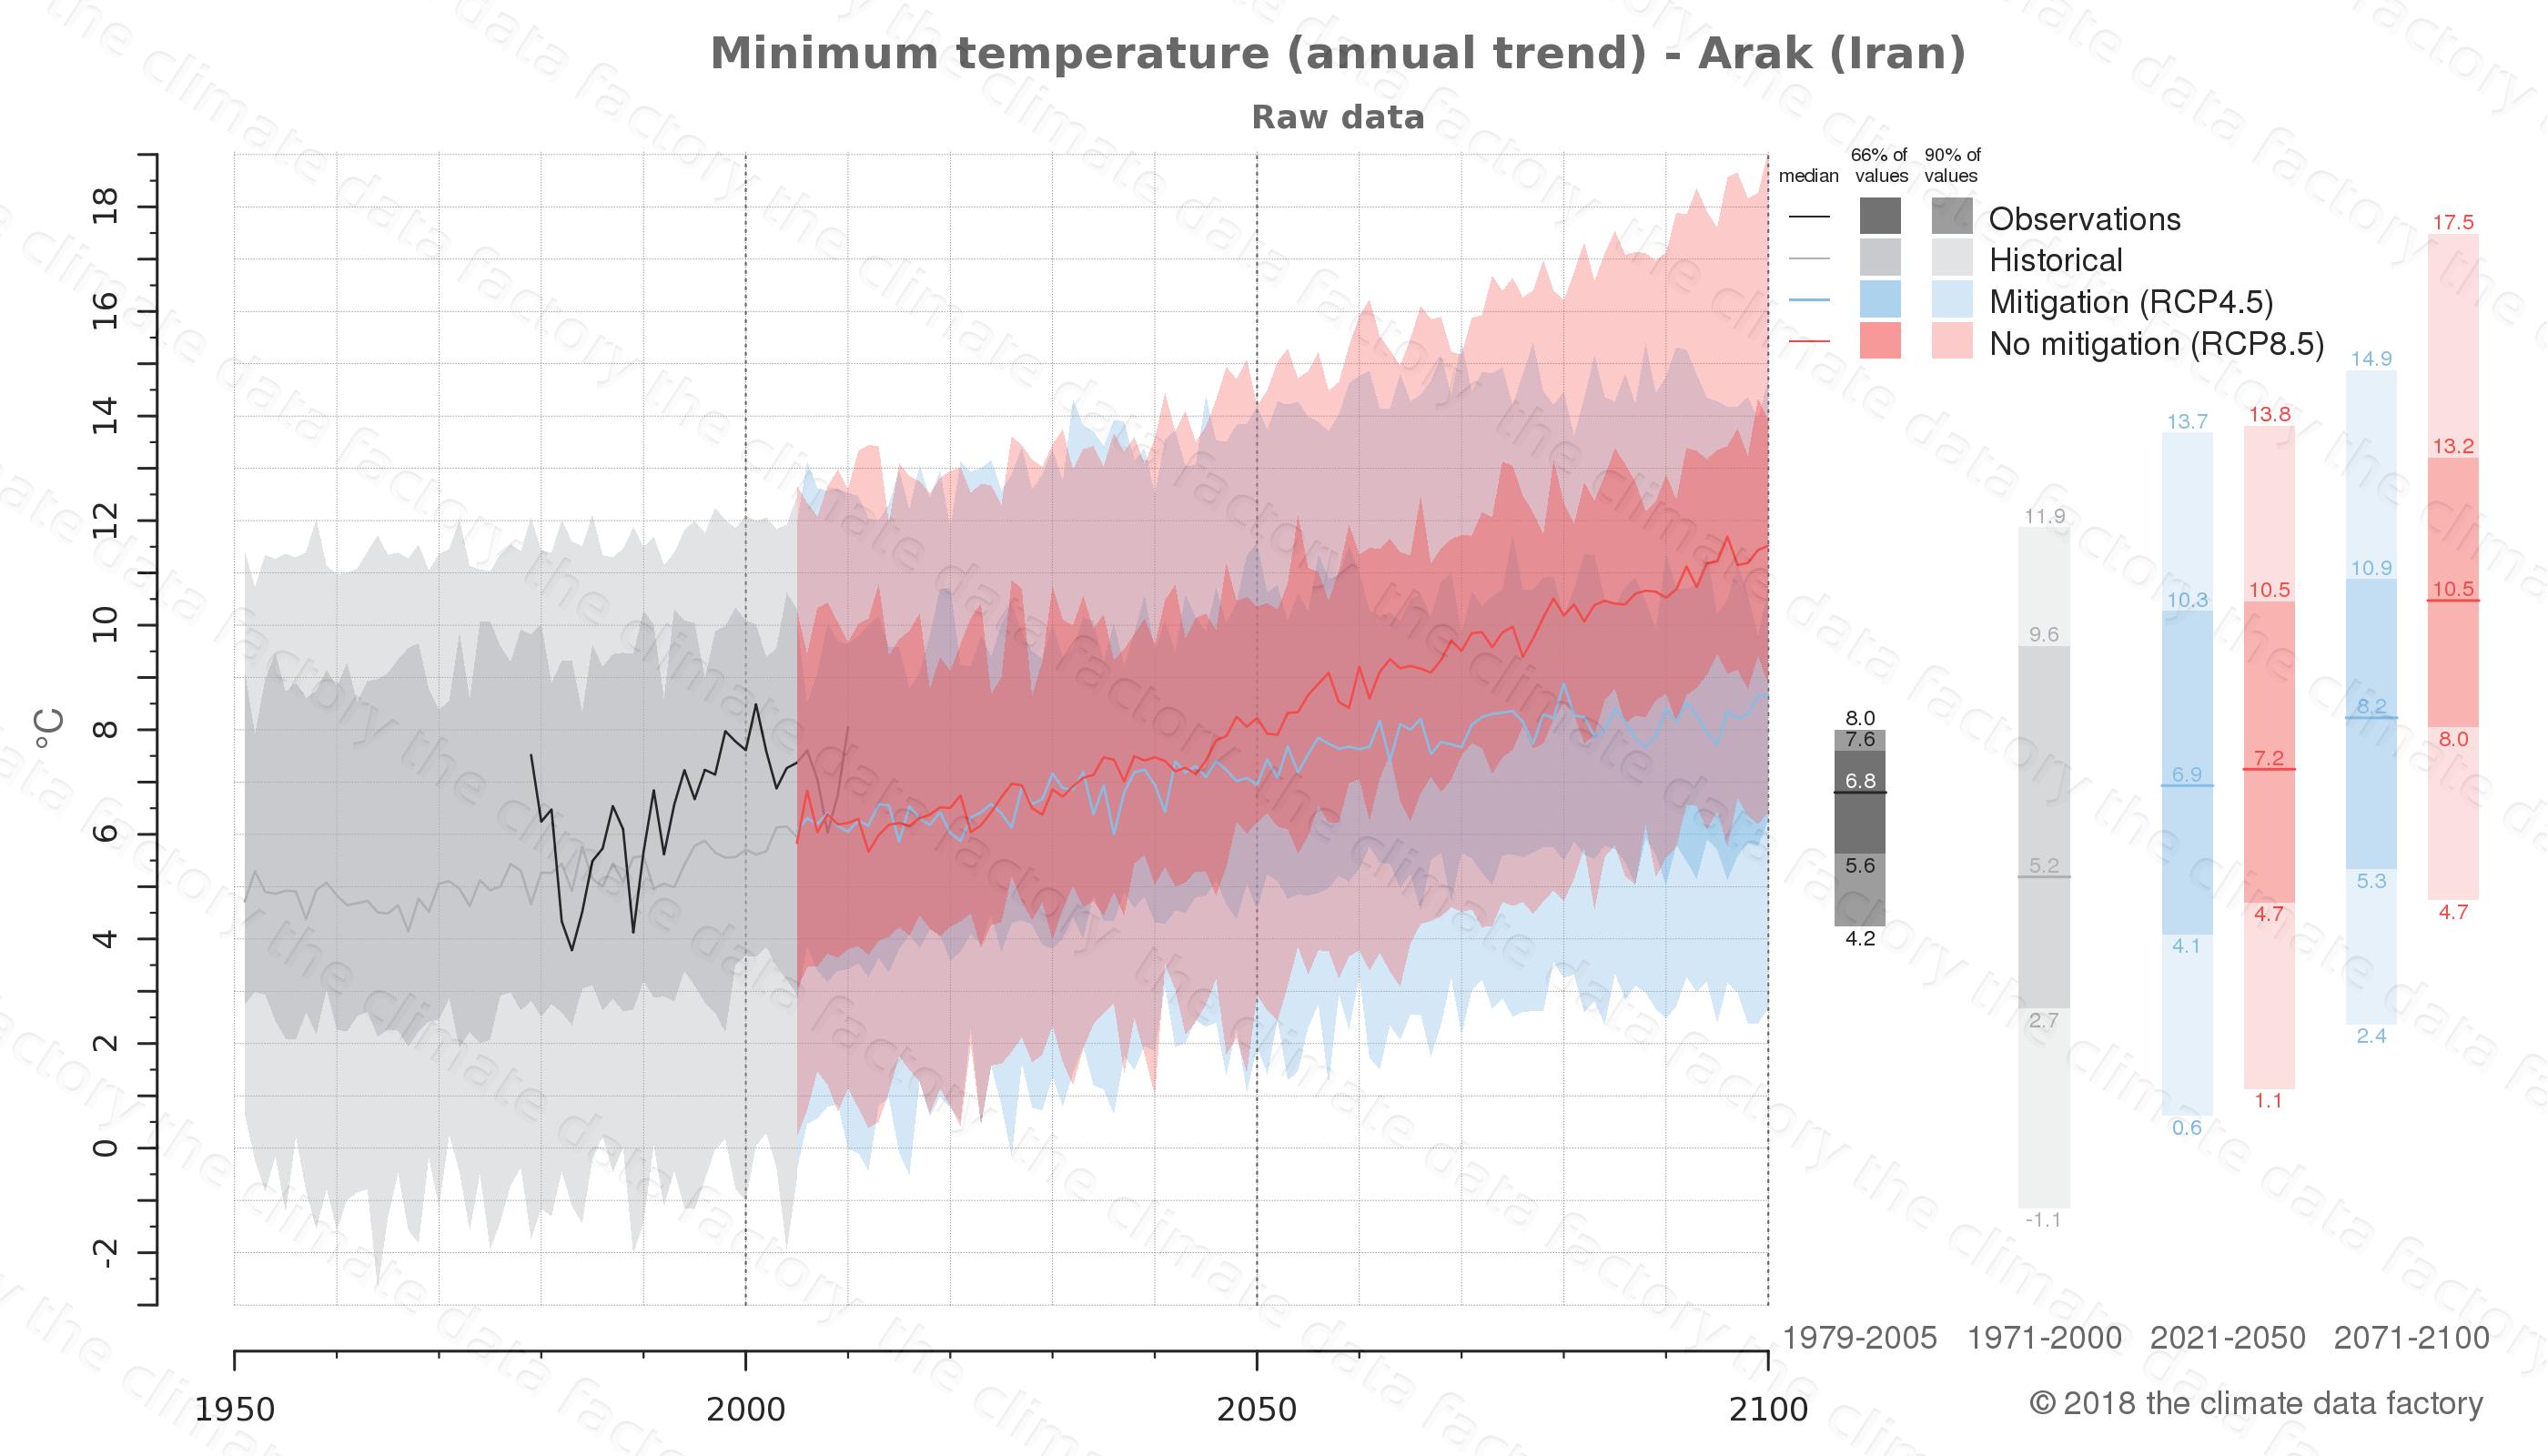 climate change data policy adaptation climate graph city data minimum-temperature arak iran